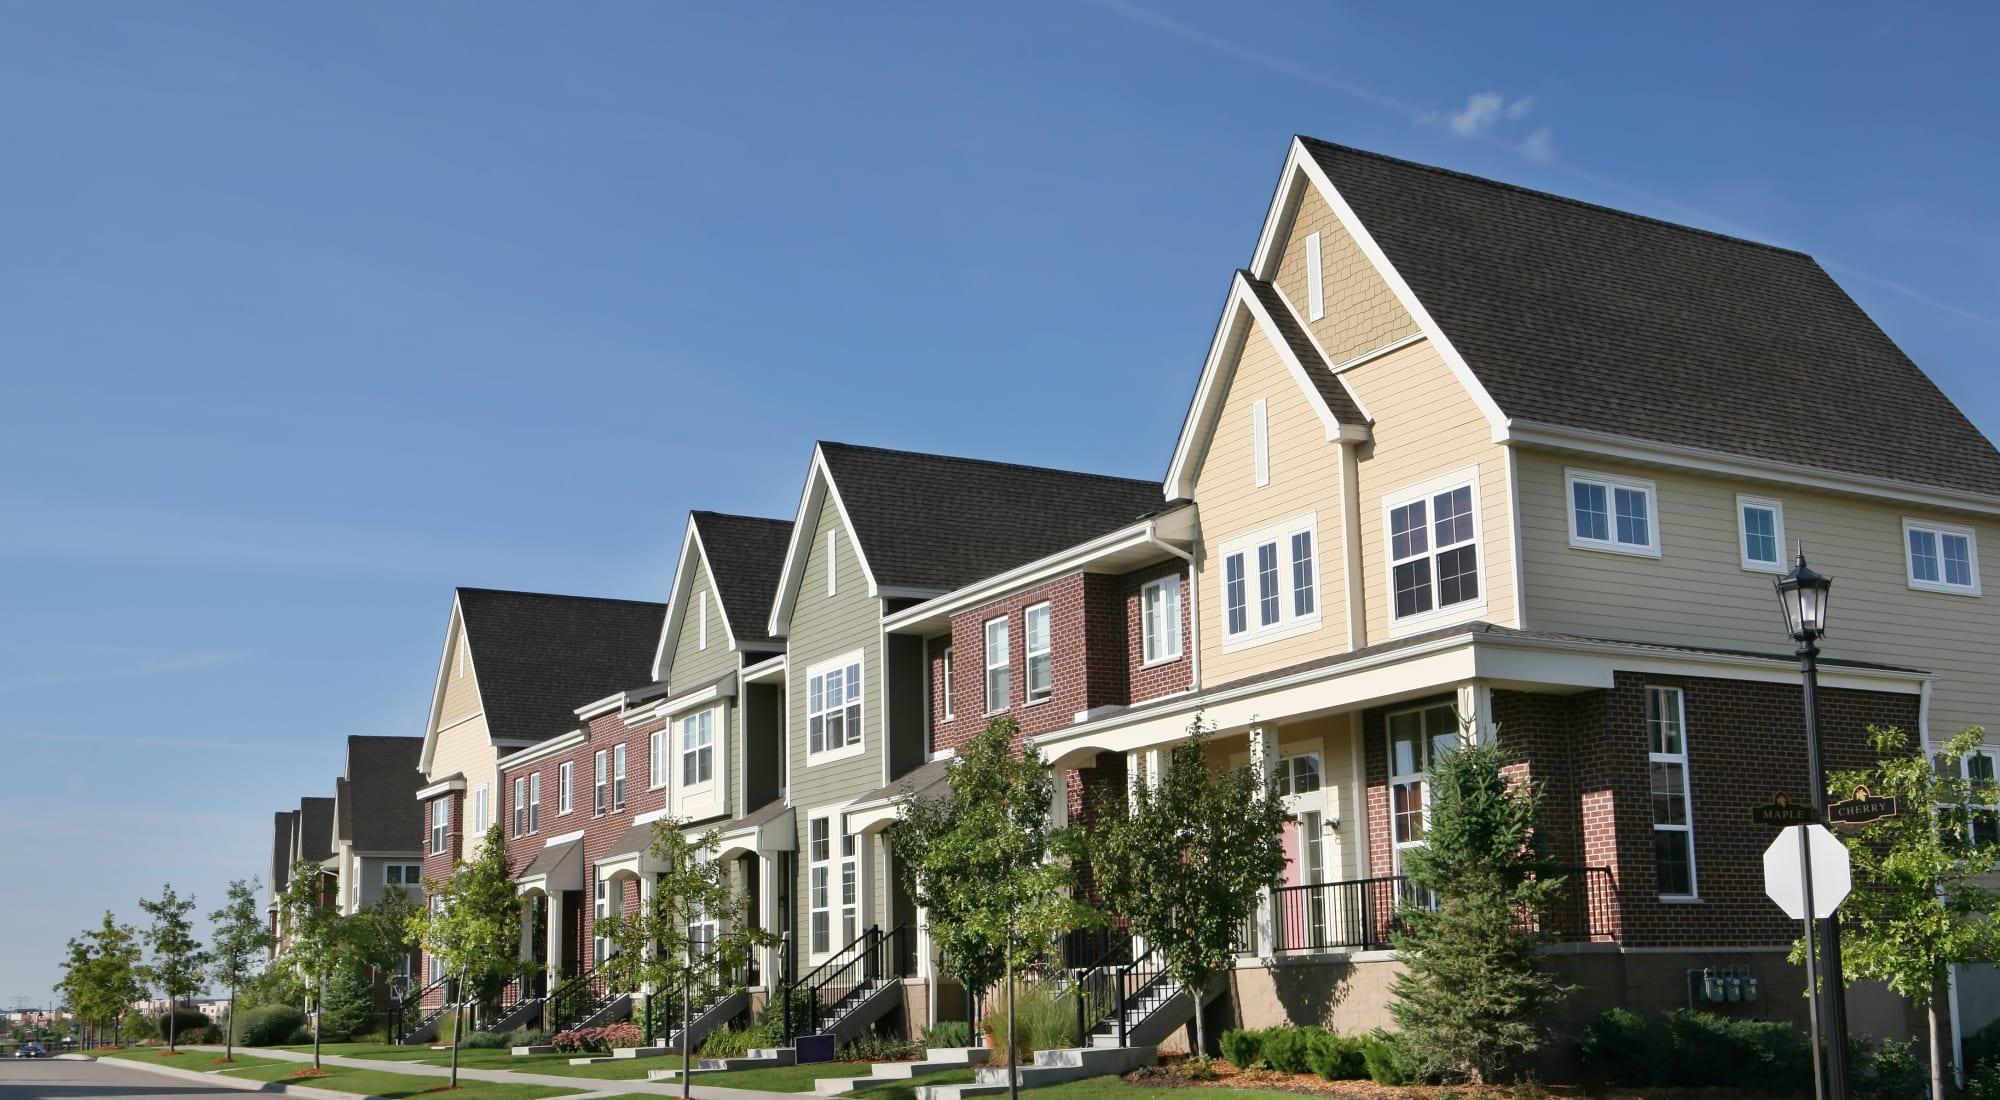 Berkley Properties, LLC in Lakewood, New Jersey offers apartments